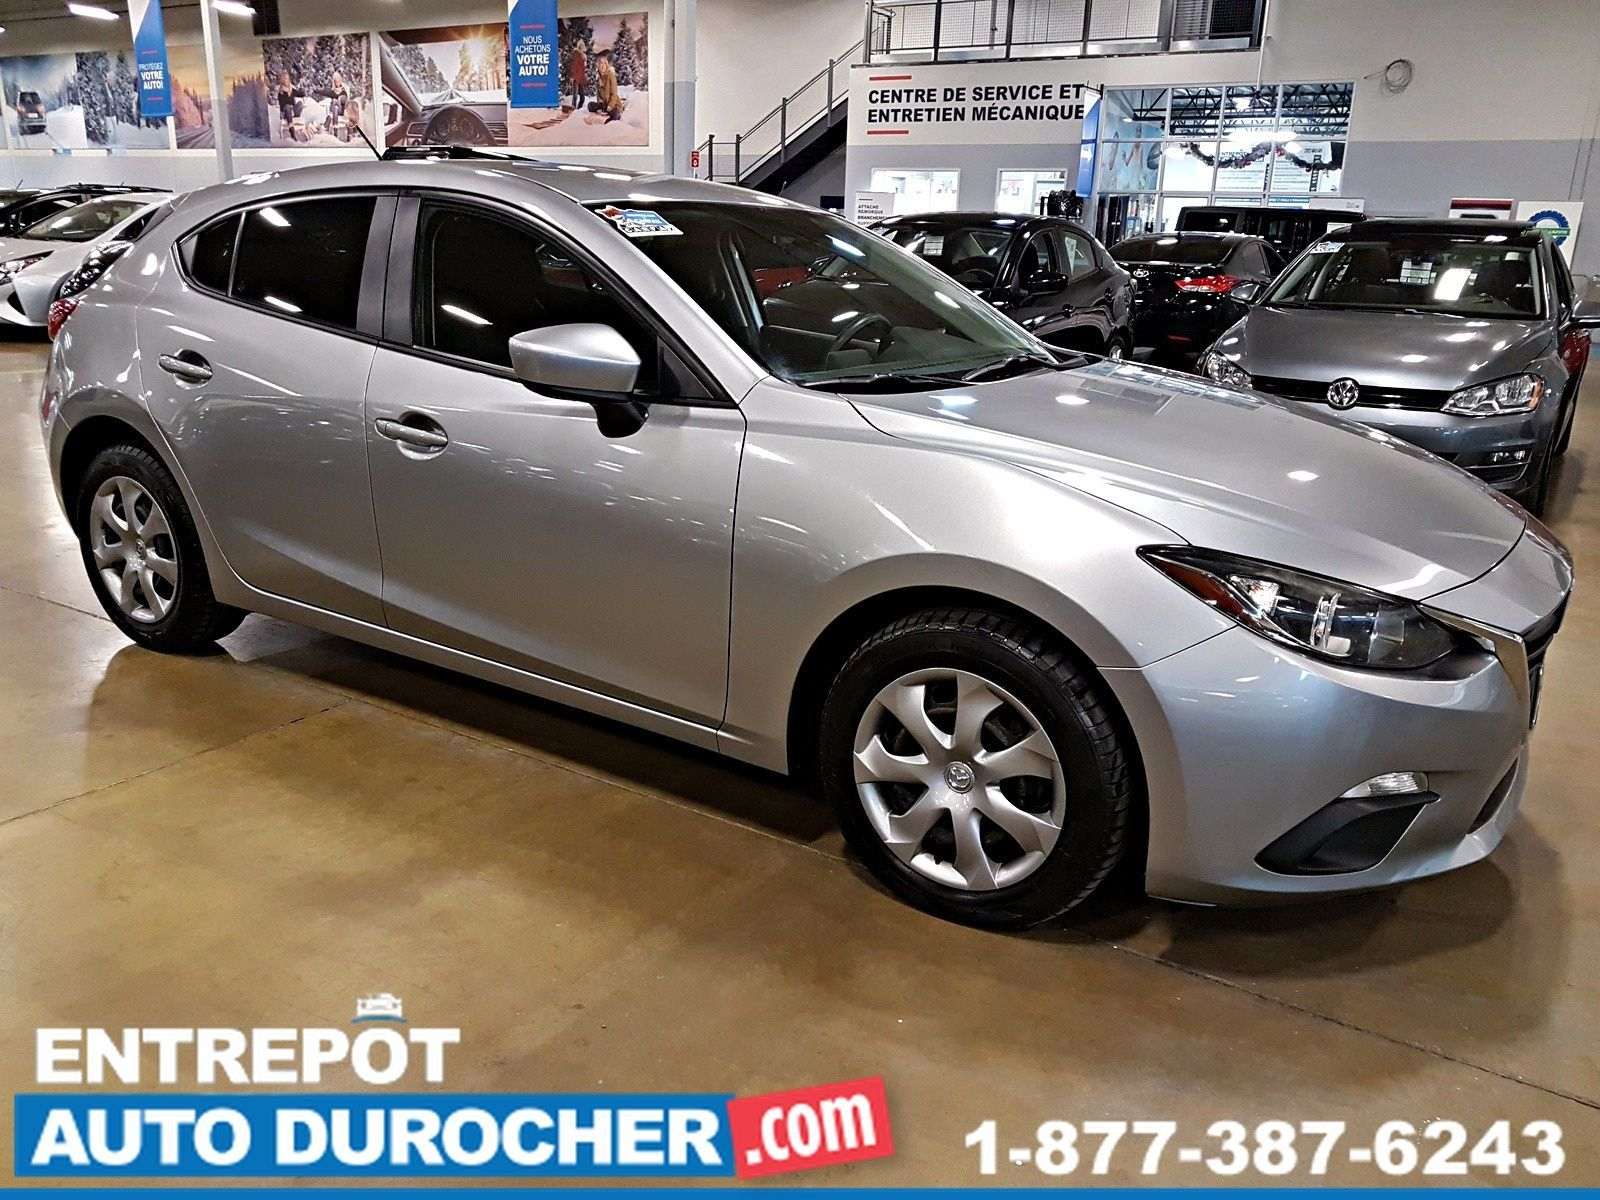 2014 Mazda Mazda3 GX Sport - Automatique - AIR CLIMATISÉ